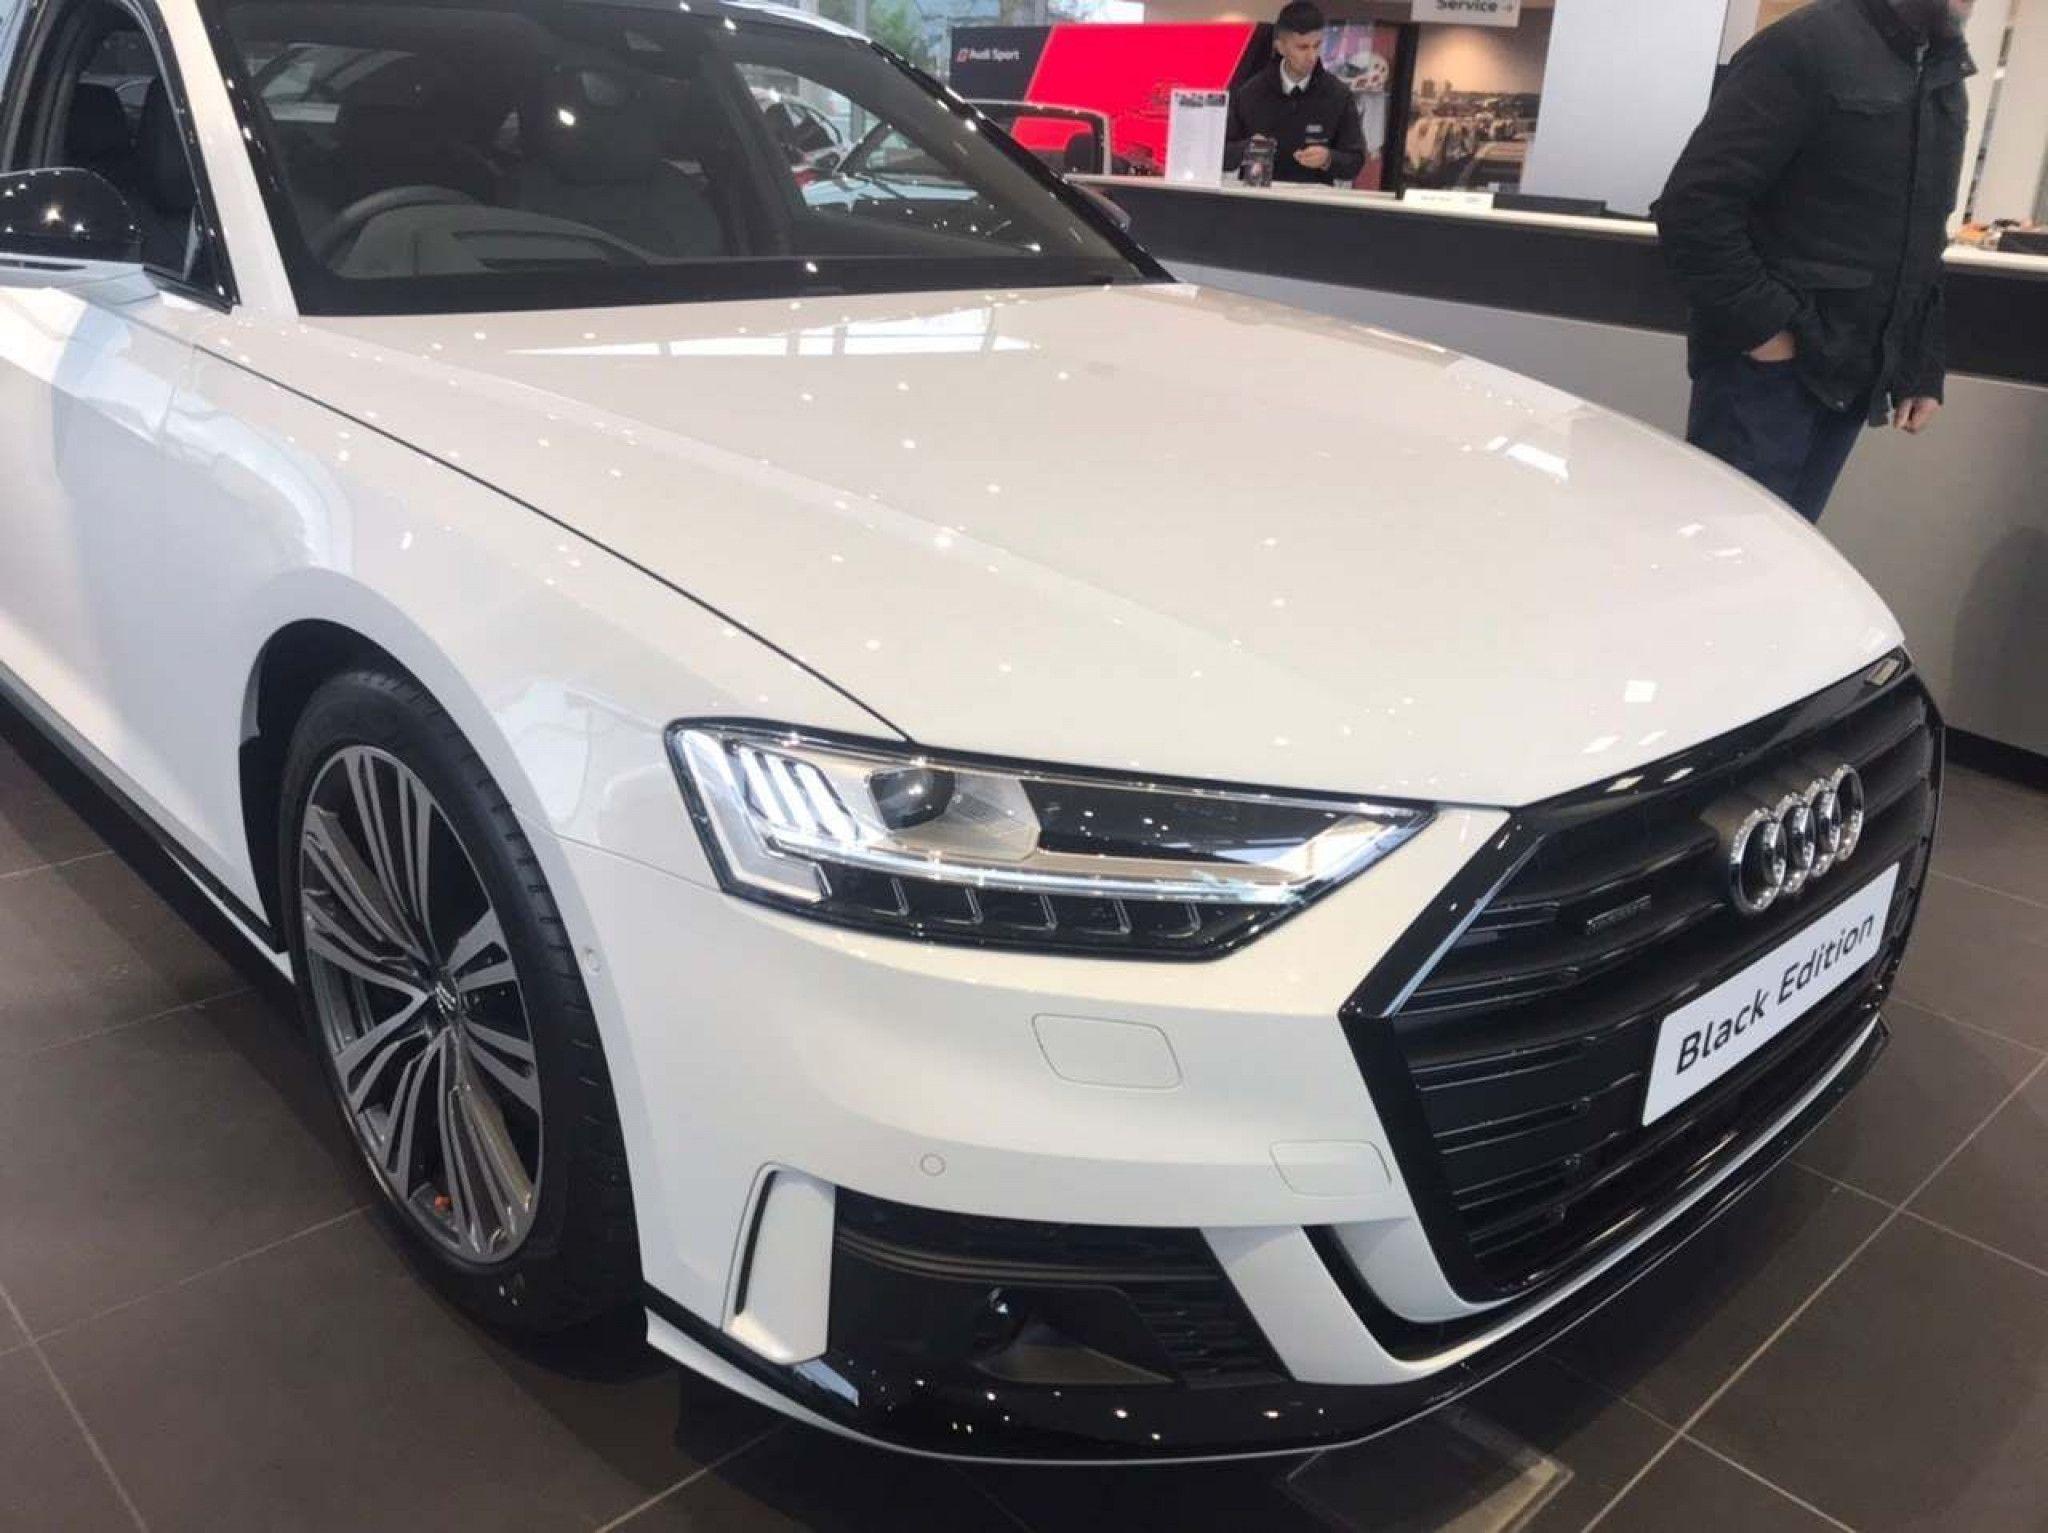 Audi A8 3 0 Tdi V6 50 Black Edition Tiptronic Quattro S S 4dr In 2020 Audi A8 Audi Black Edition